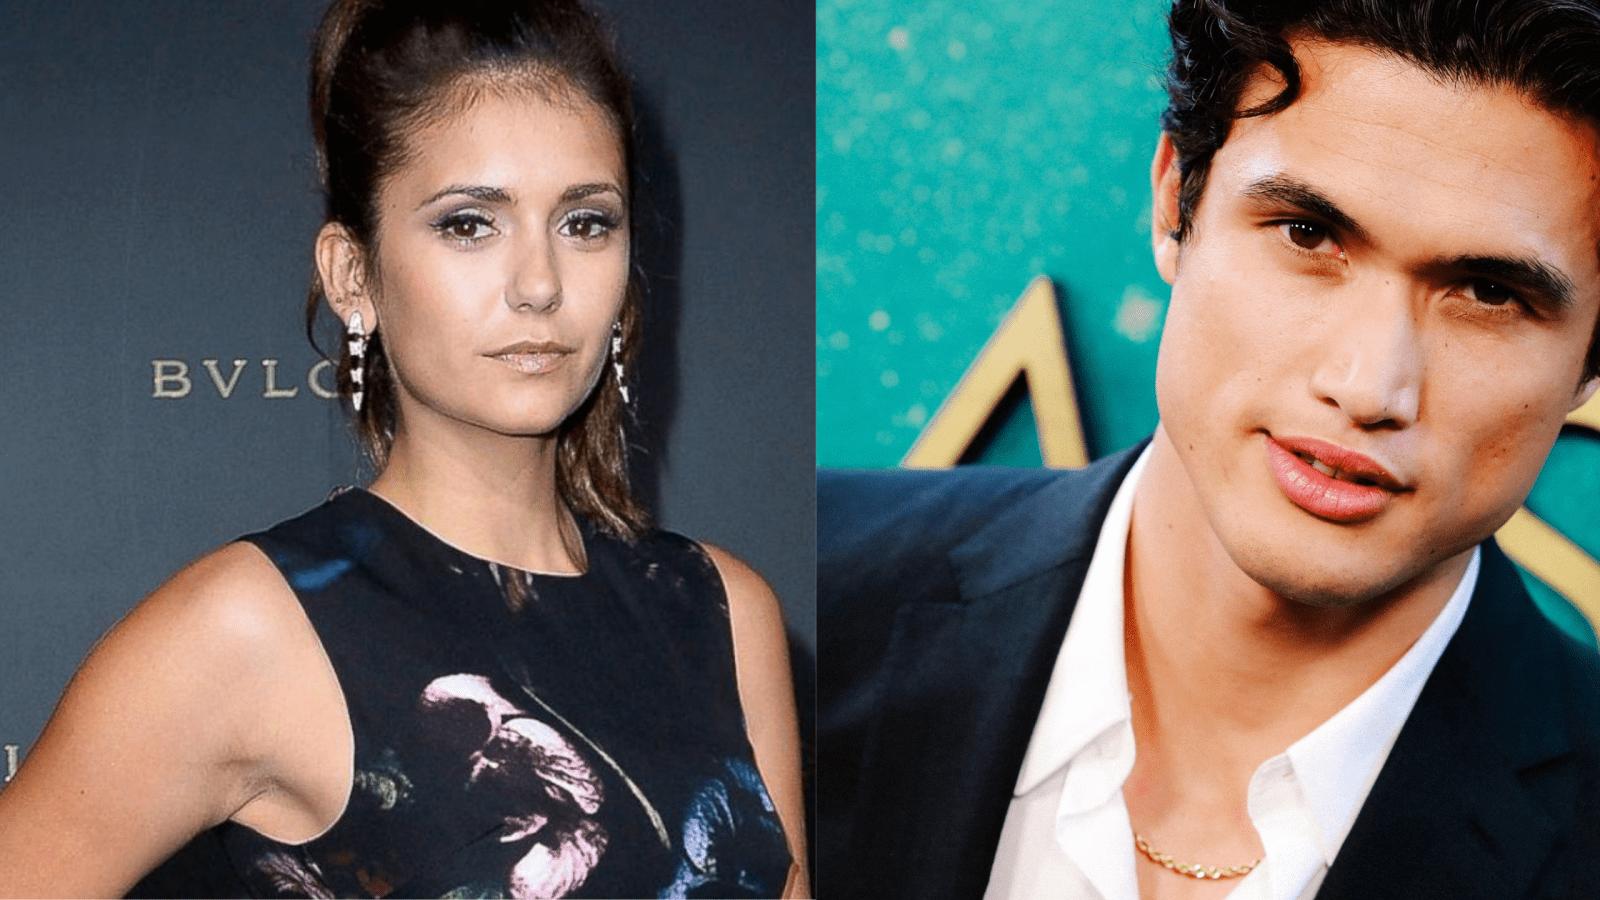 Who Stars Alongside Nina Dobrev?